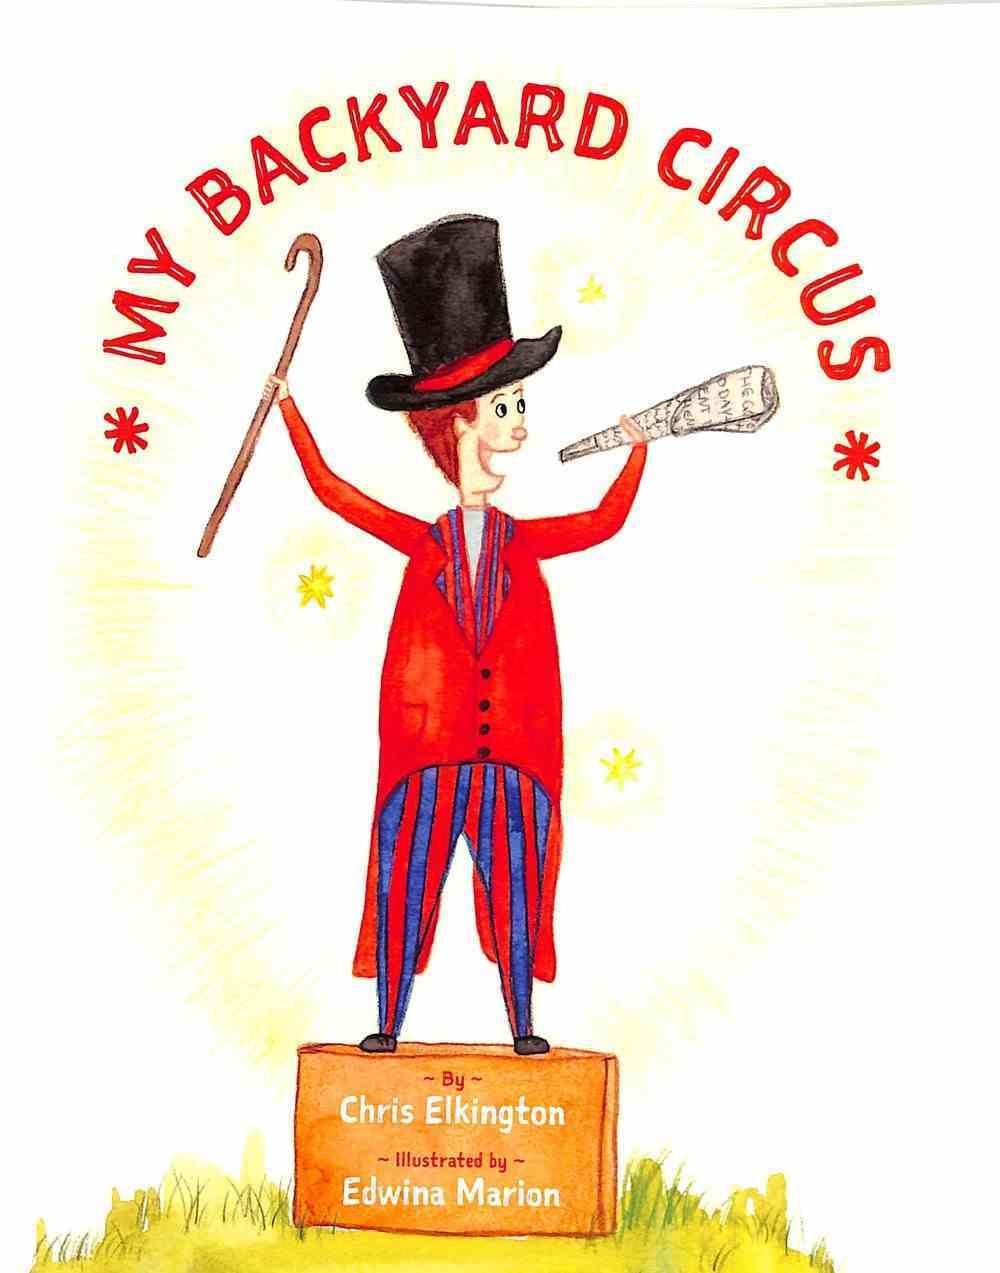 My Backyard Circus Paperback